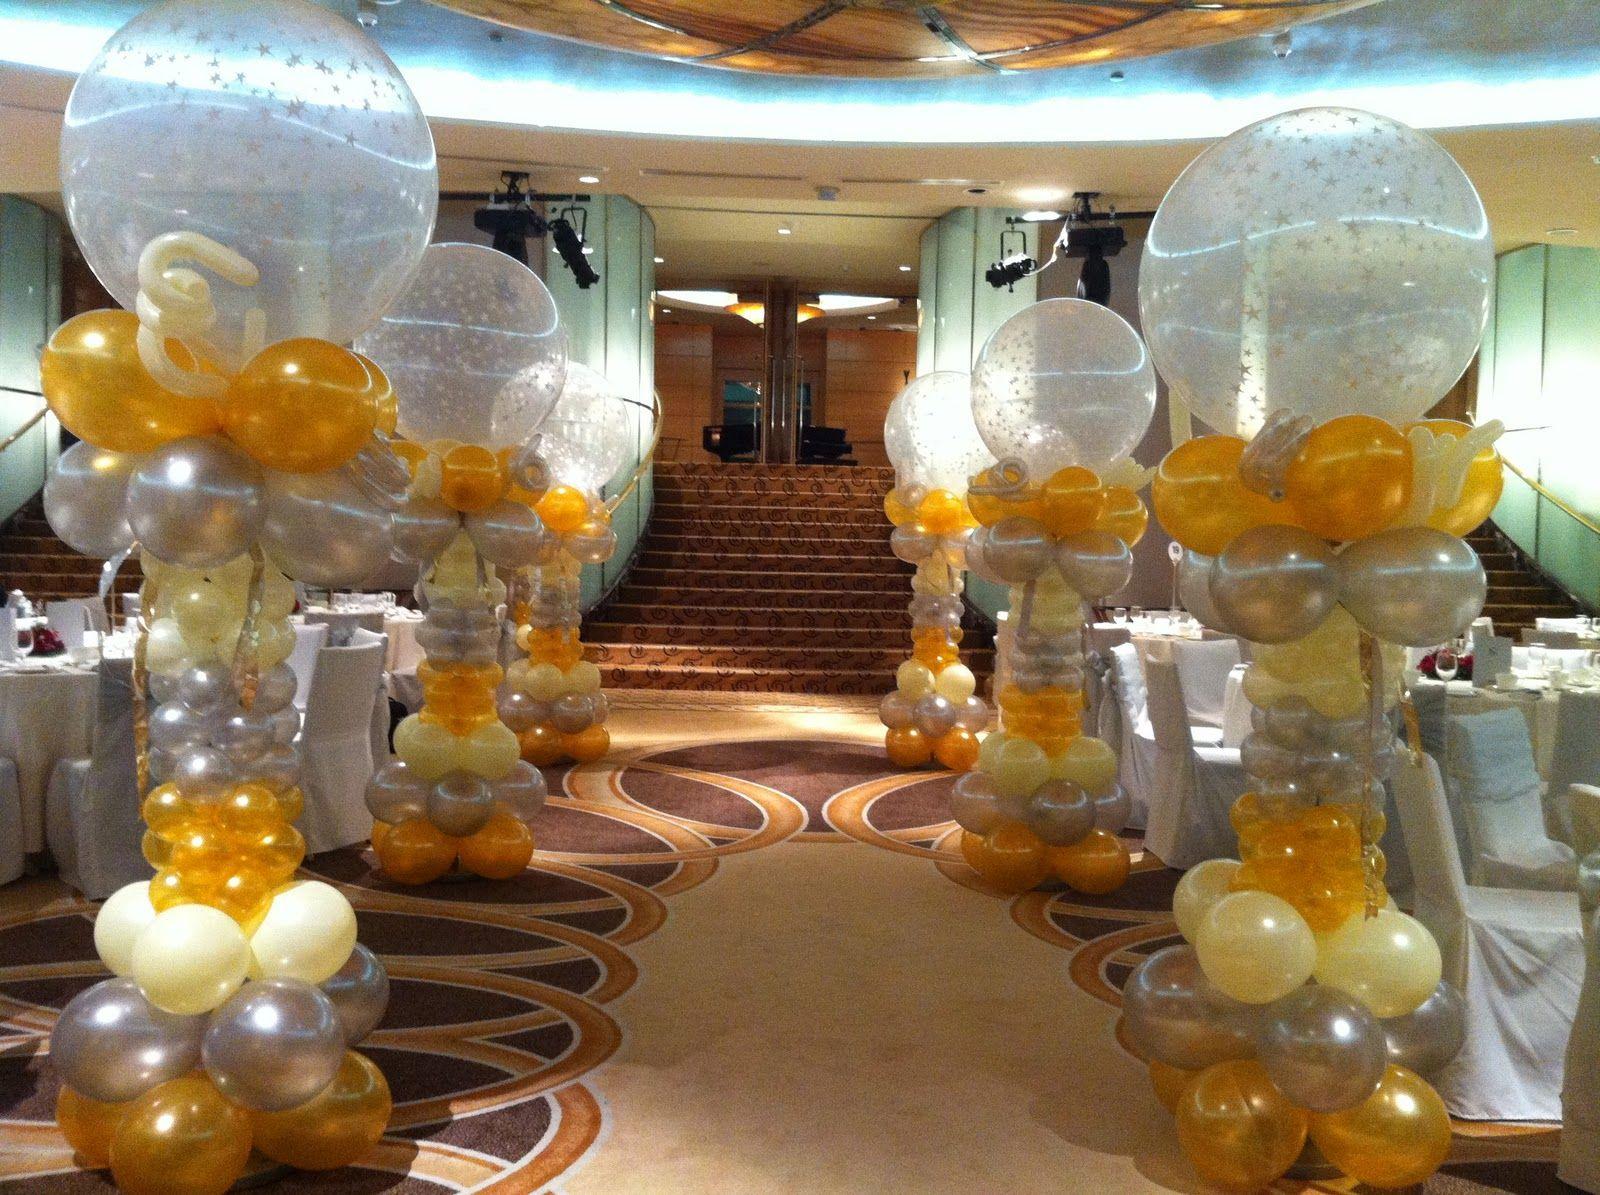 Wedding decoration ideas with balloons  birthday party themes for adults  Birthday party decorating ideas